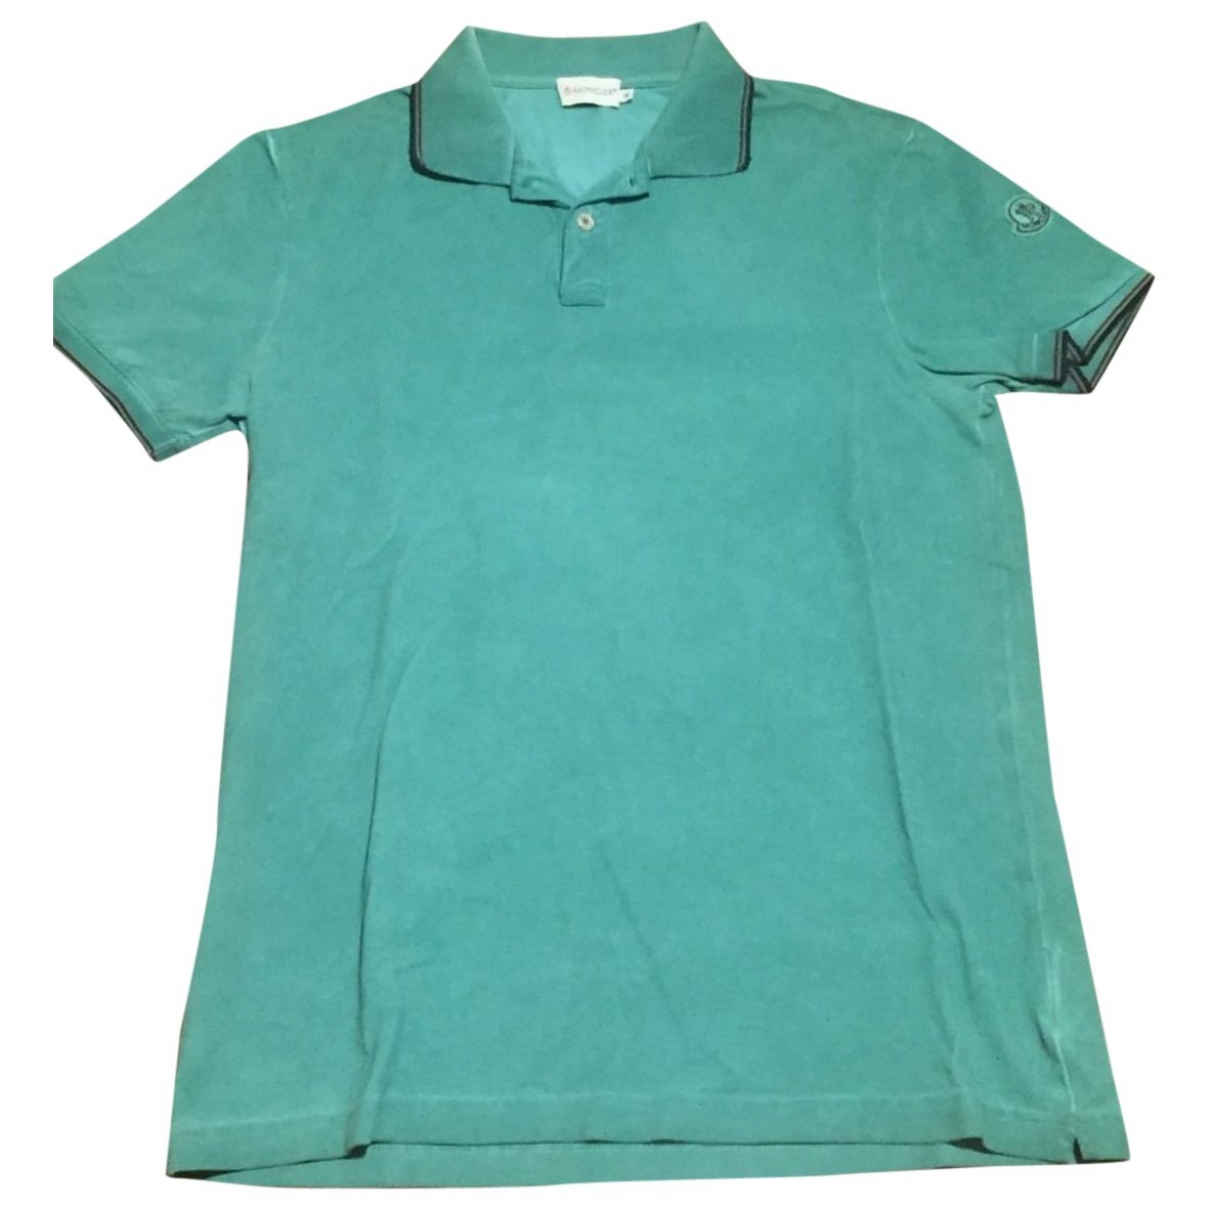 Moncler \N Poloshirts in  Gruen Baumwolle